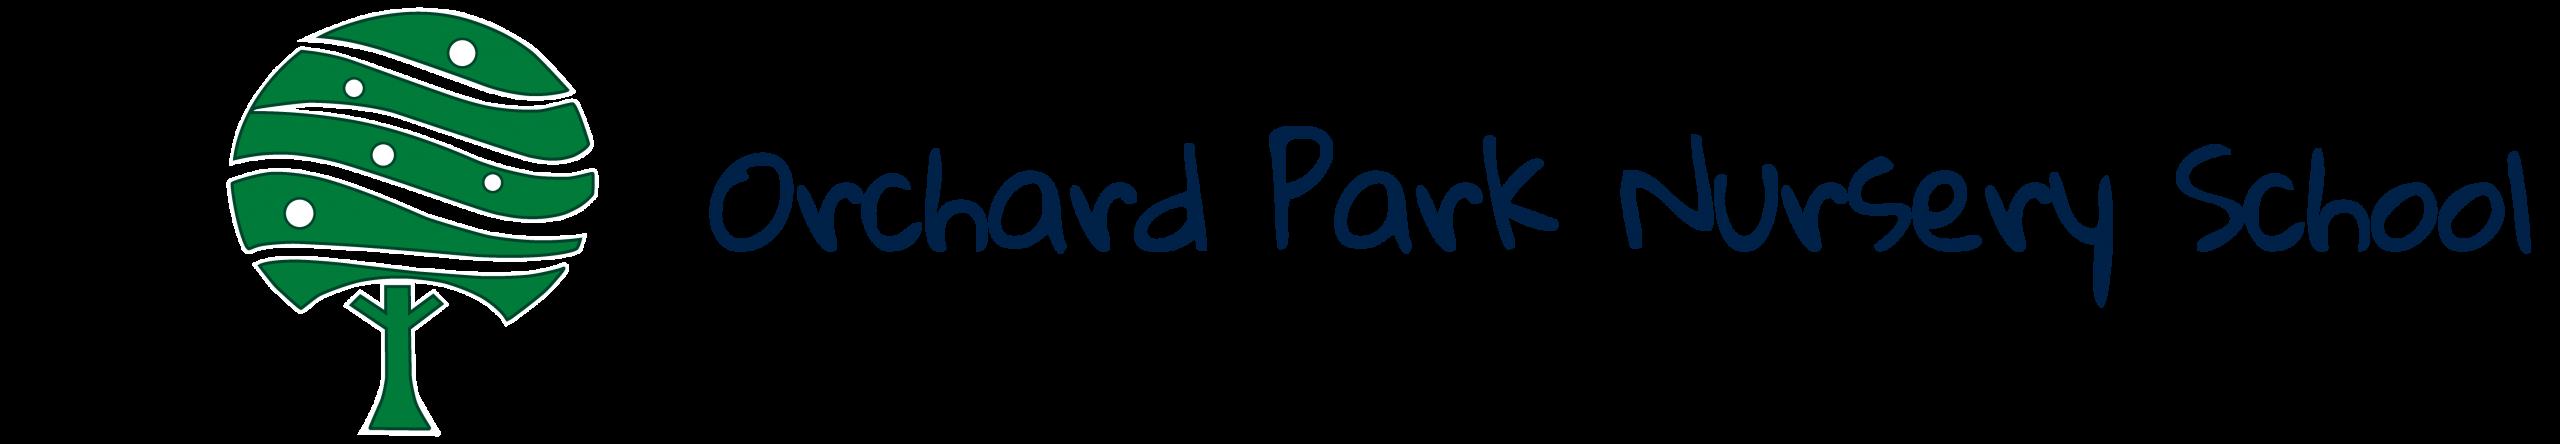 Orchard Park Nursery School